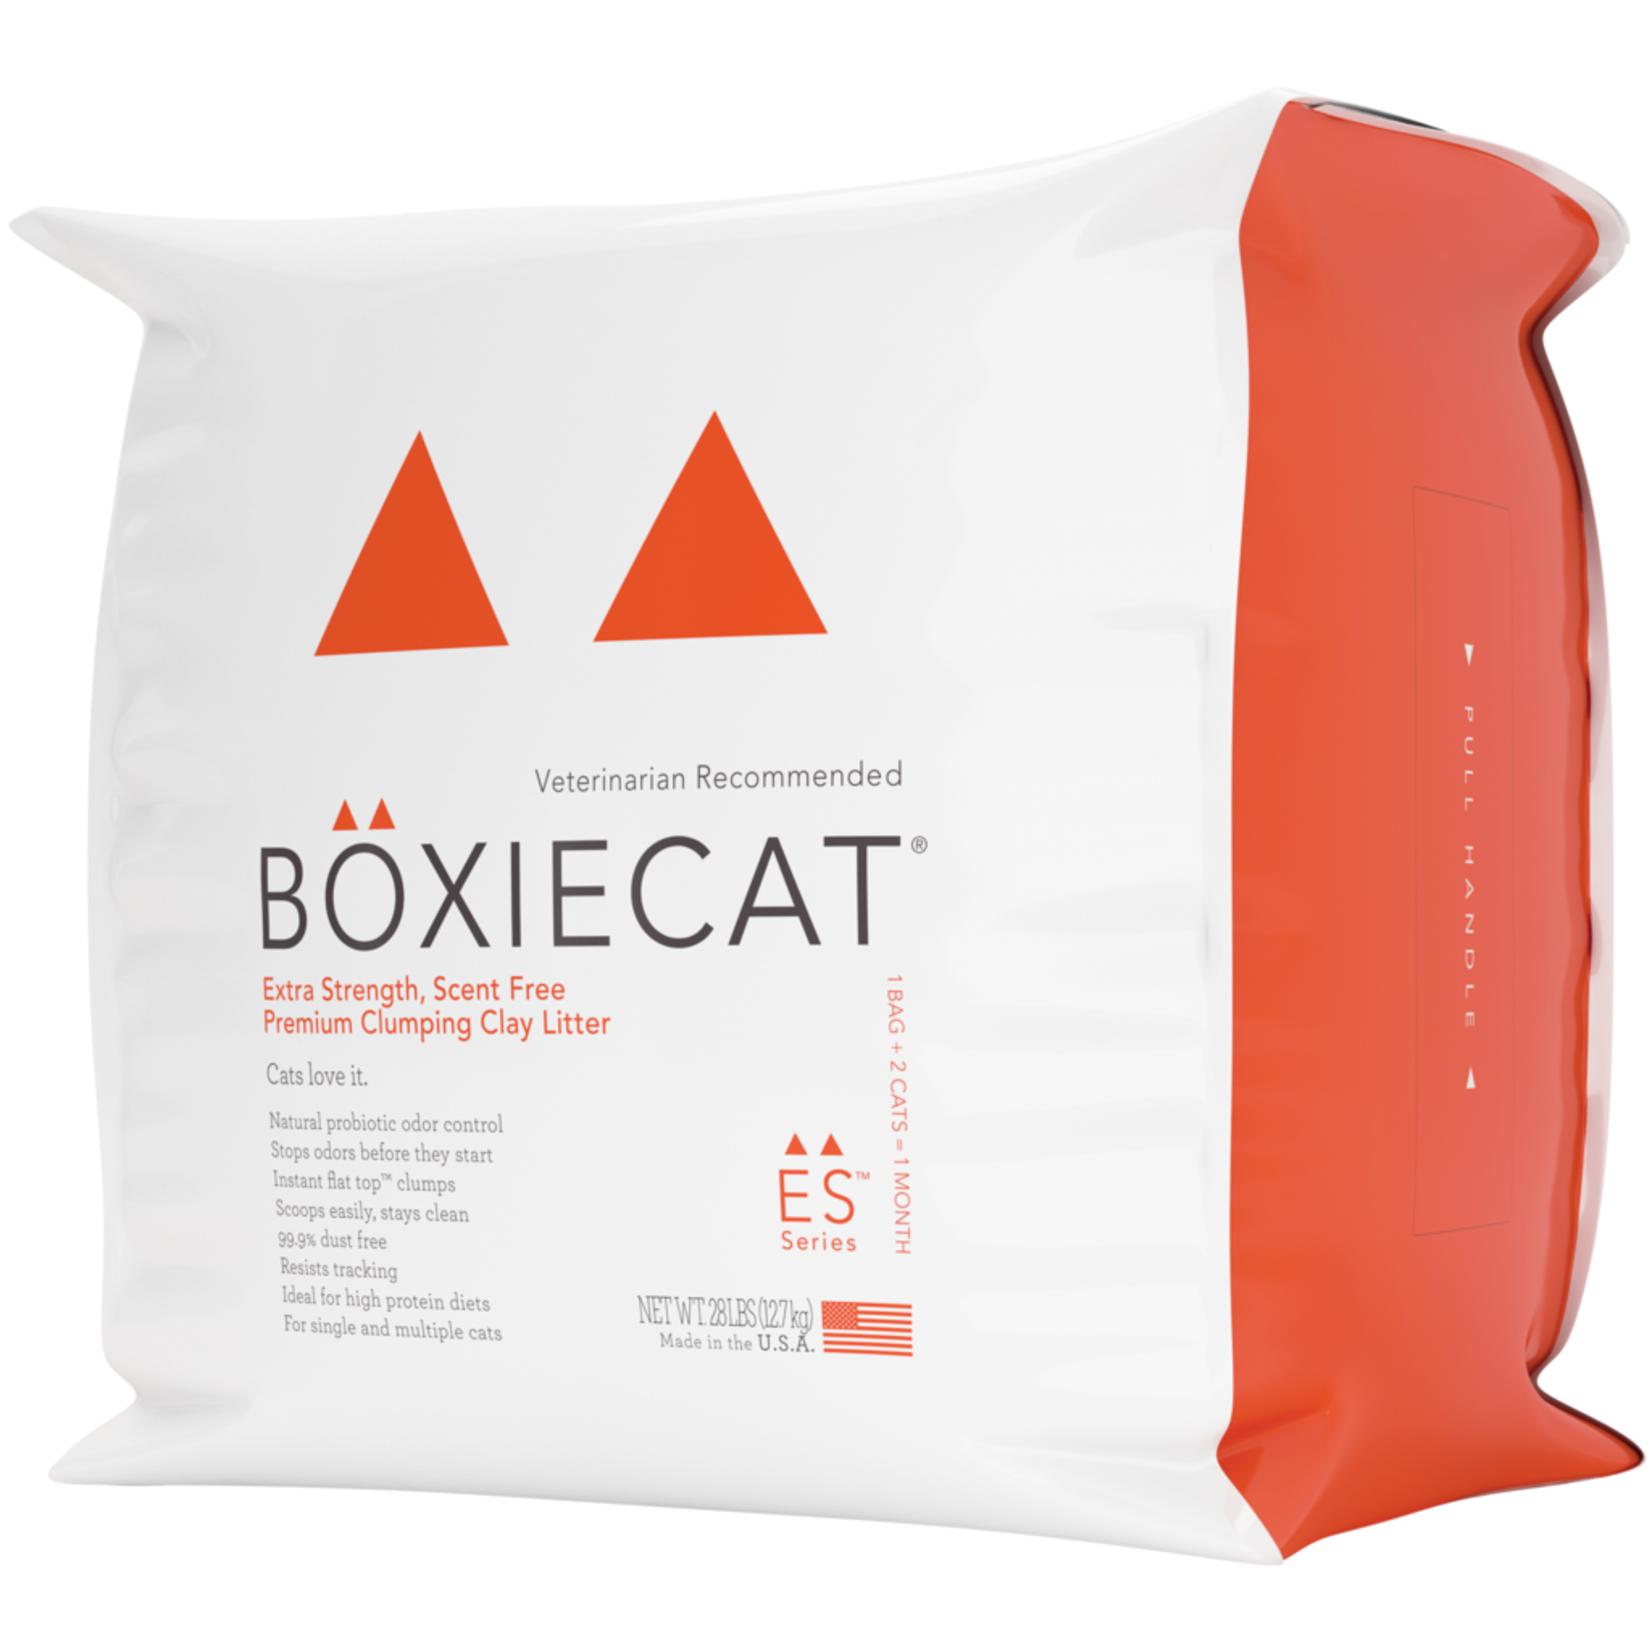 Boxie Cat Boxie Cat Clay Litter Extra Strength 28#